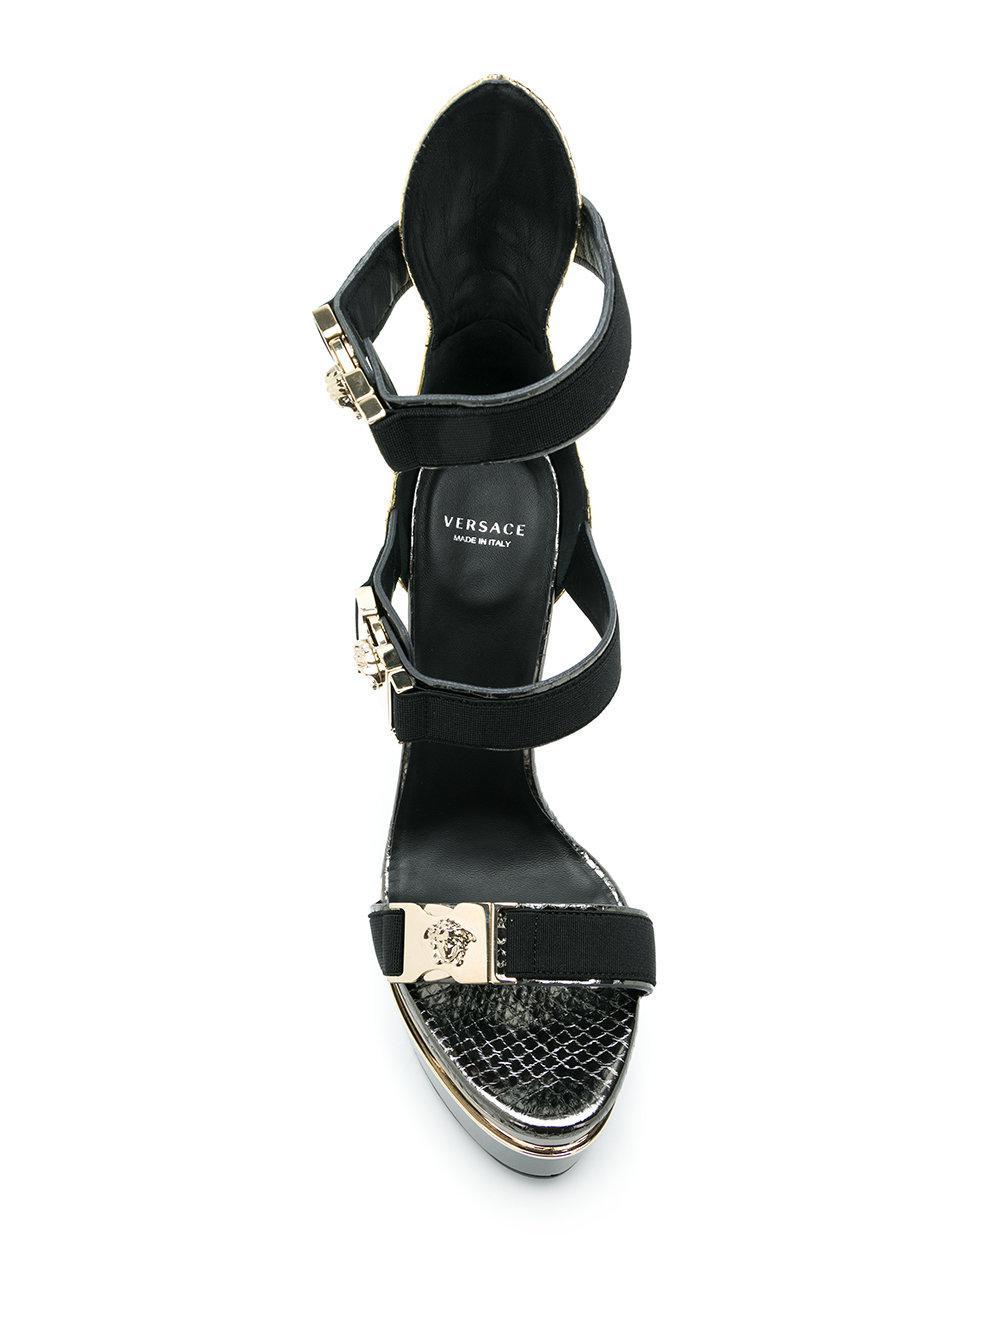 b595e7c74b4 Versace Medusa Platform Sandals in Black - Lyst